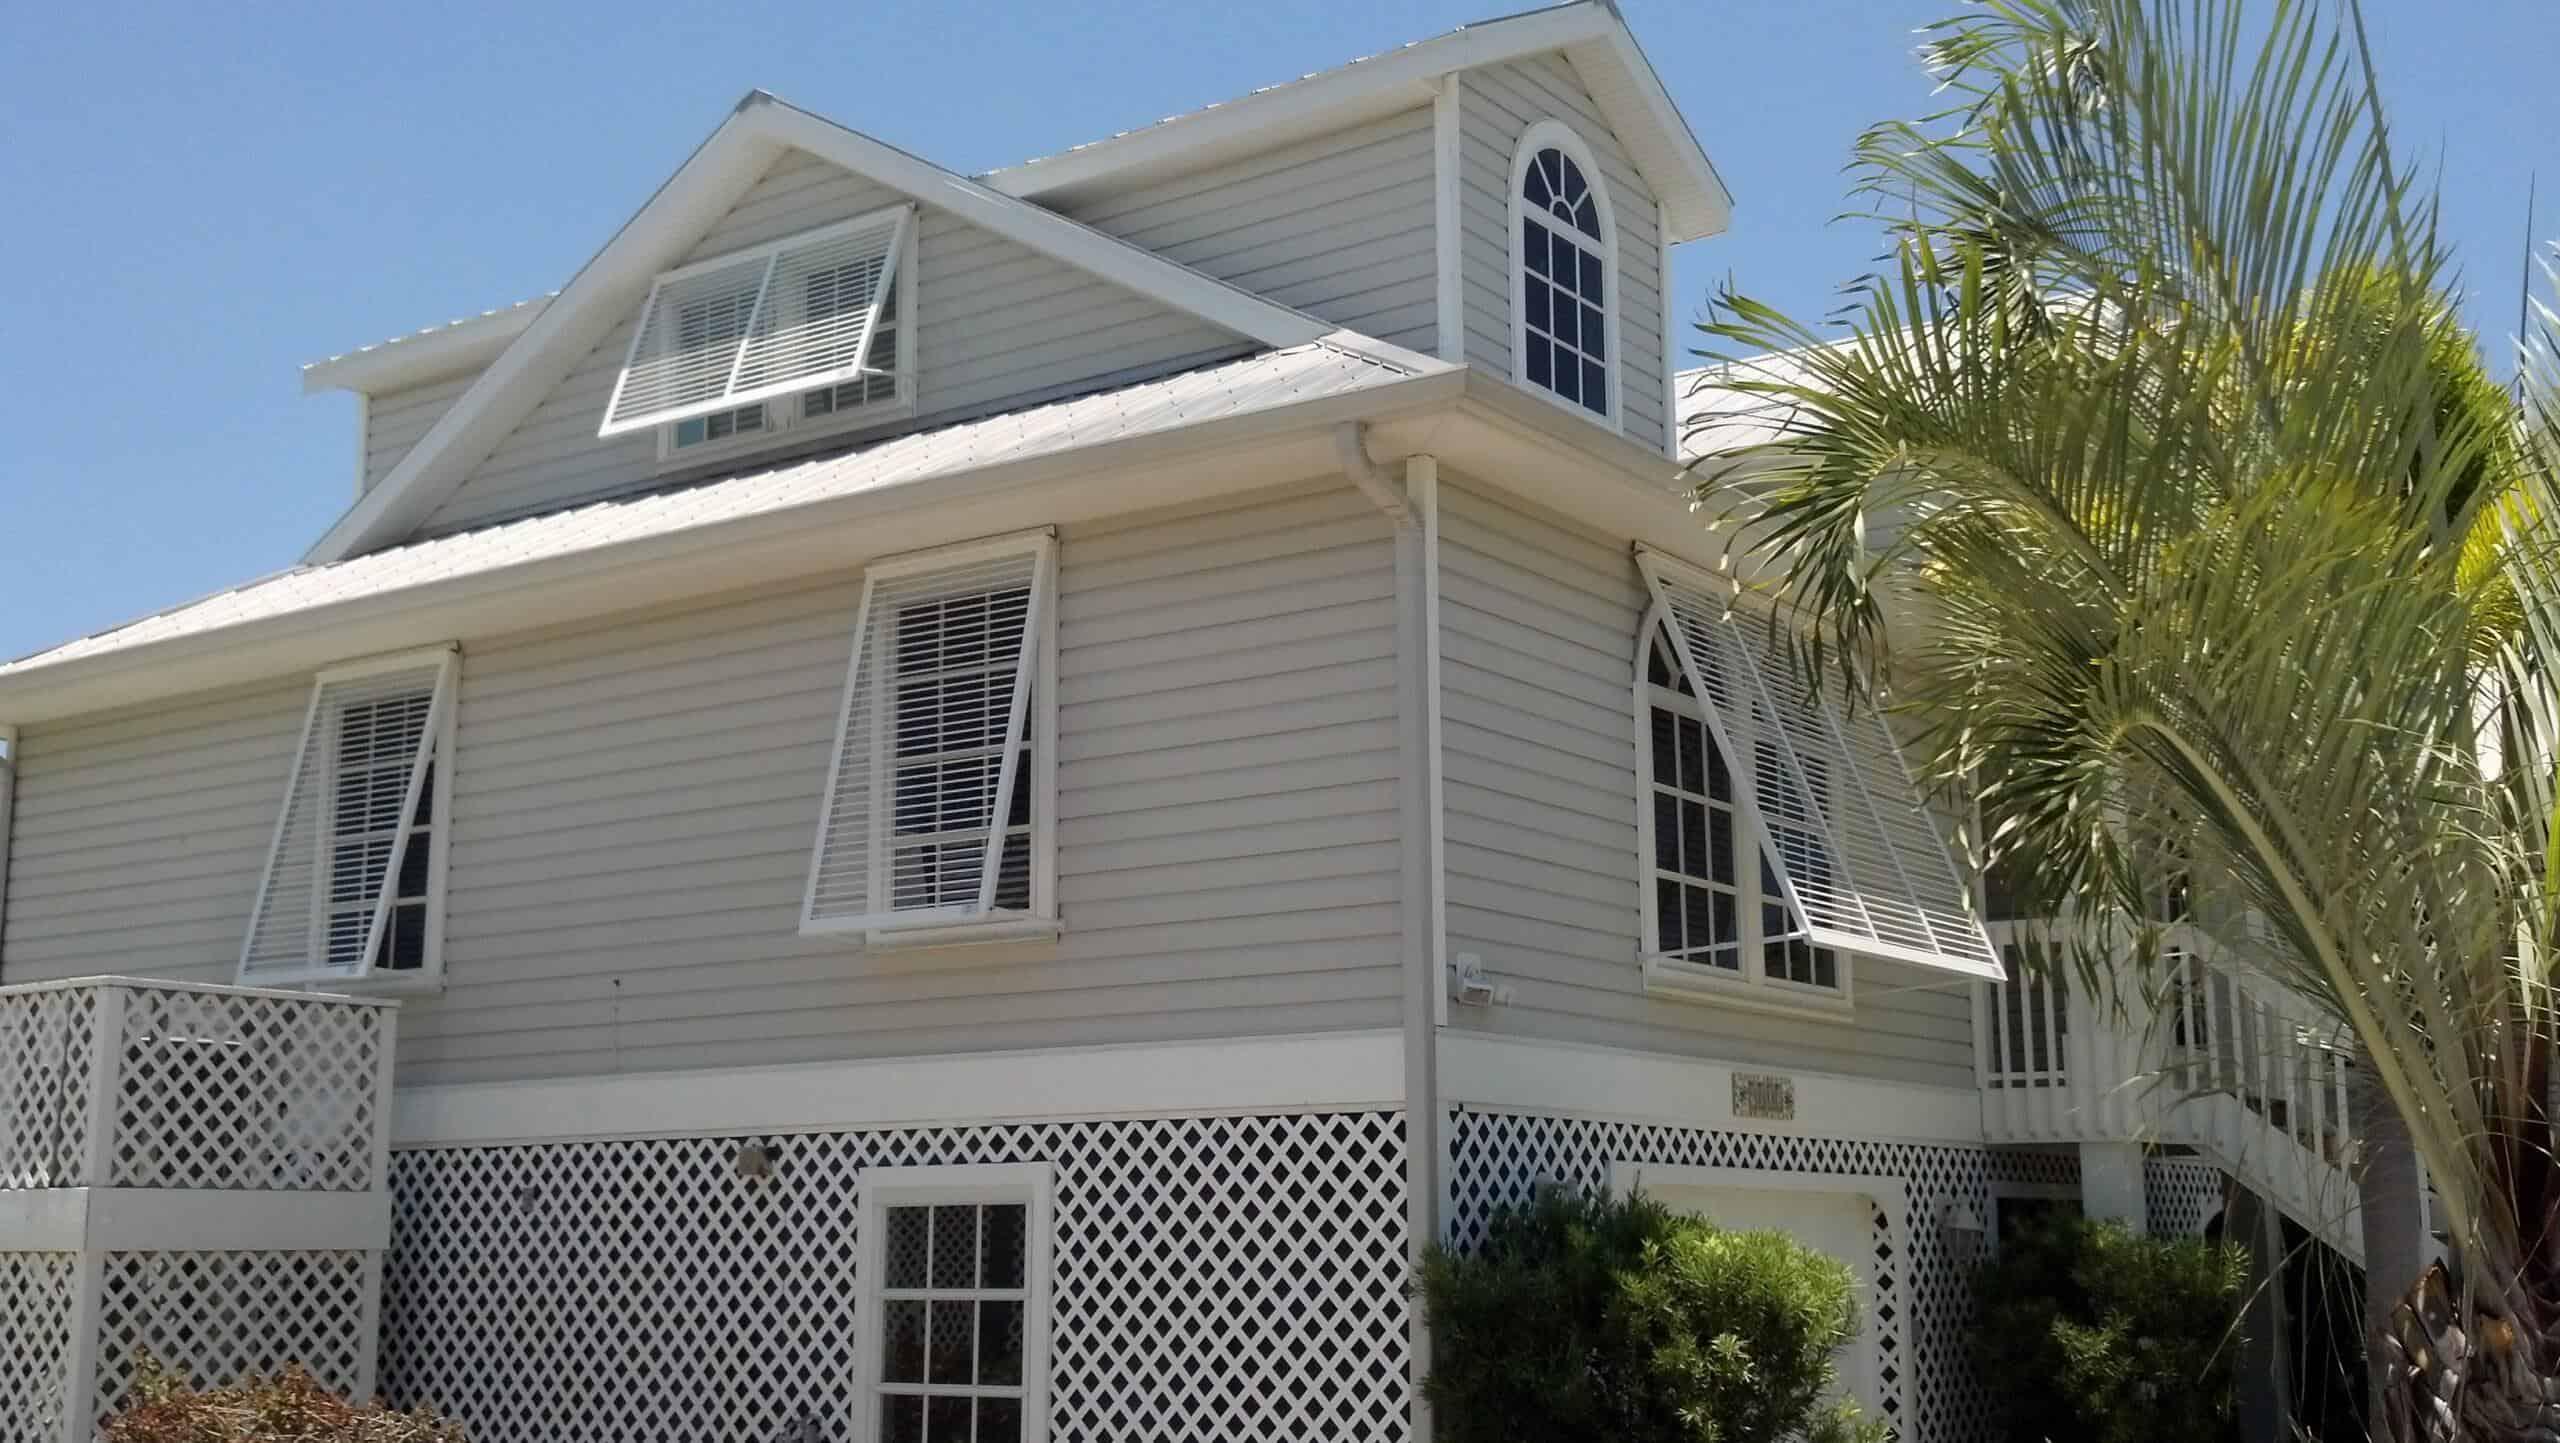 bahama hurricane shutters on tan house